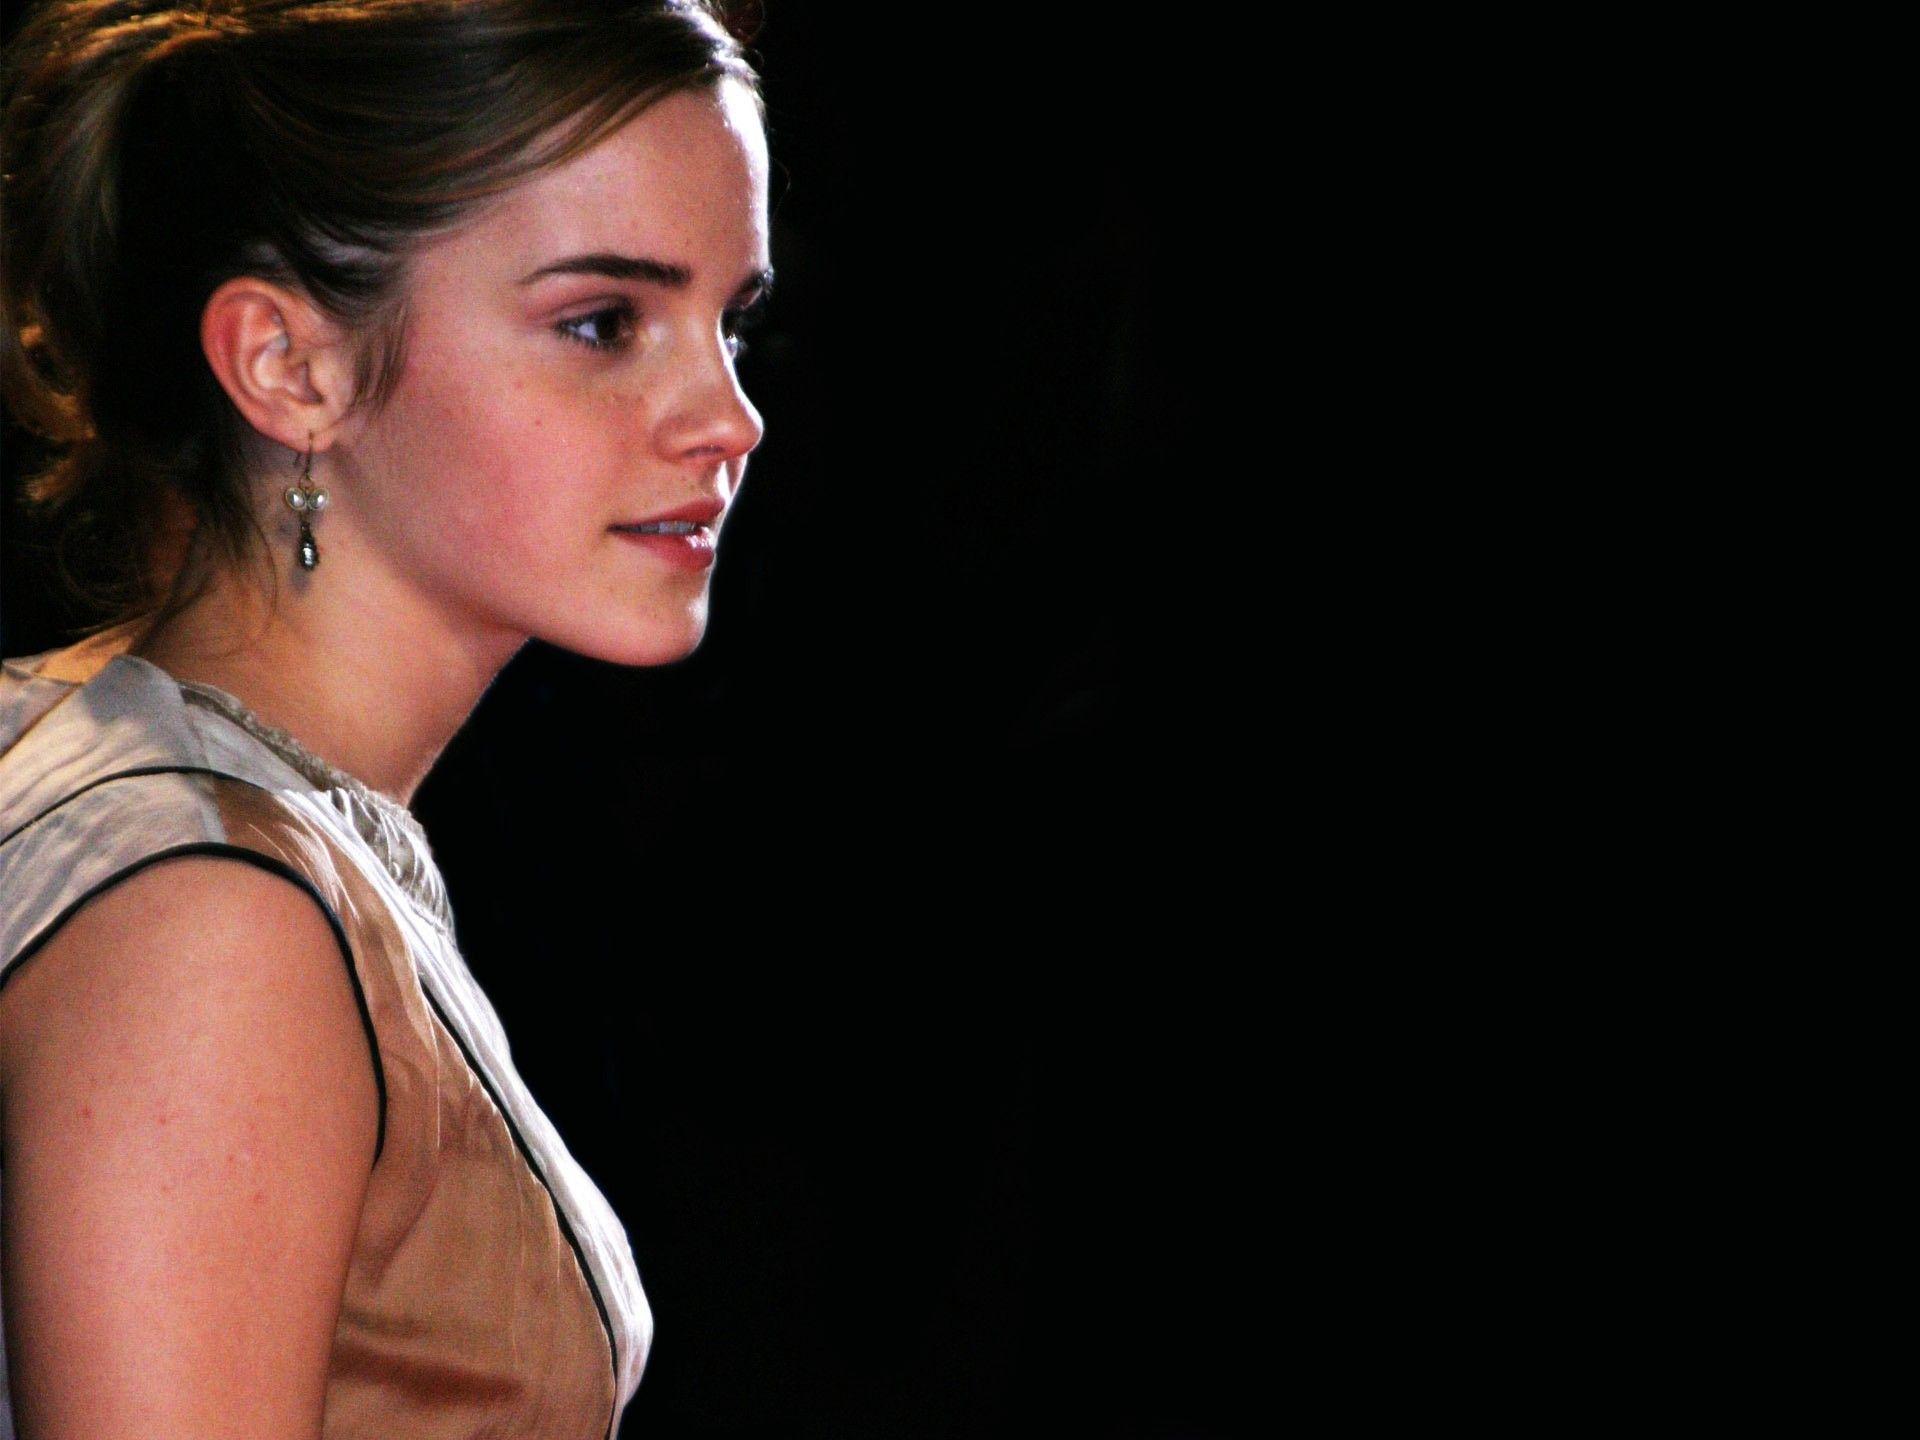 Emma Watson Wallpapers 2015 - Wallpaper Cave